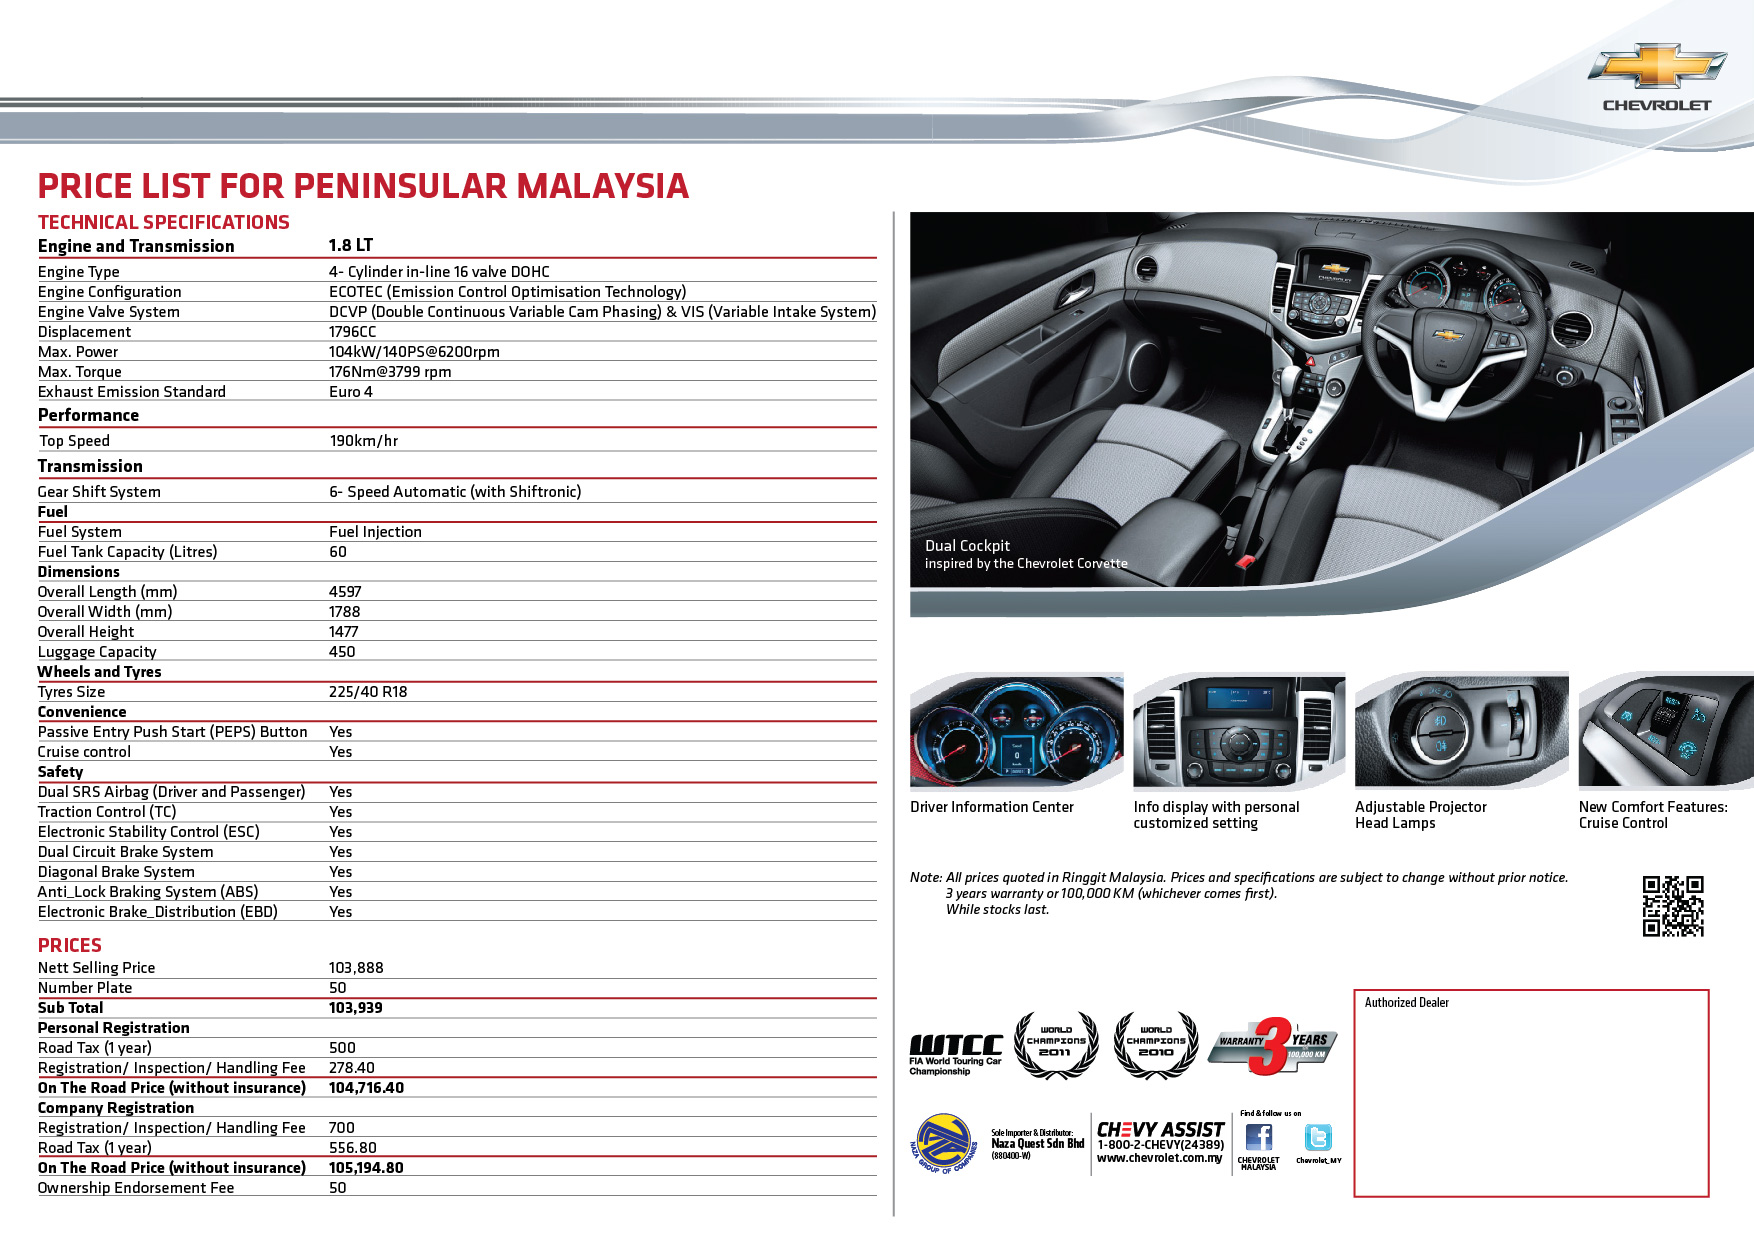 2018 Chevrolet Sonic Price >> Chevrolet updates Cruze, Sonic and Orlando prices Paul Tan - Image 146980